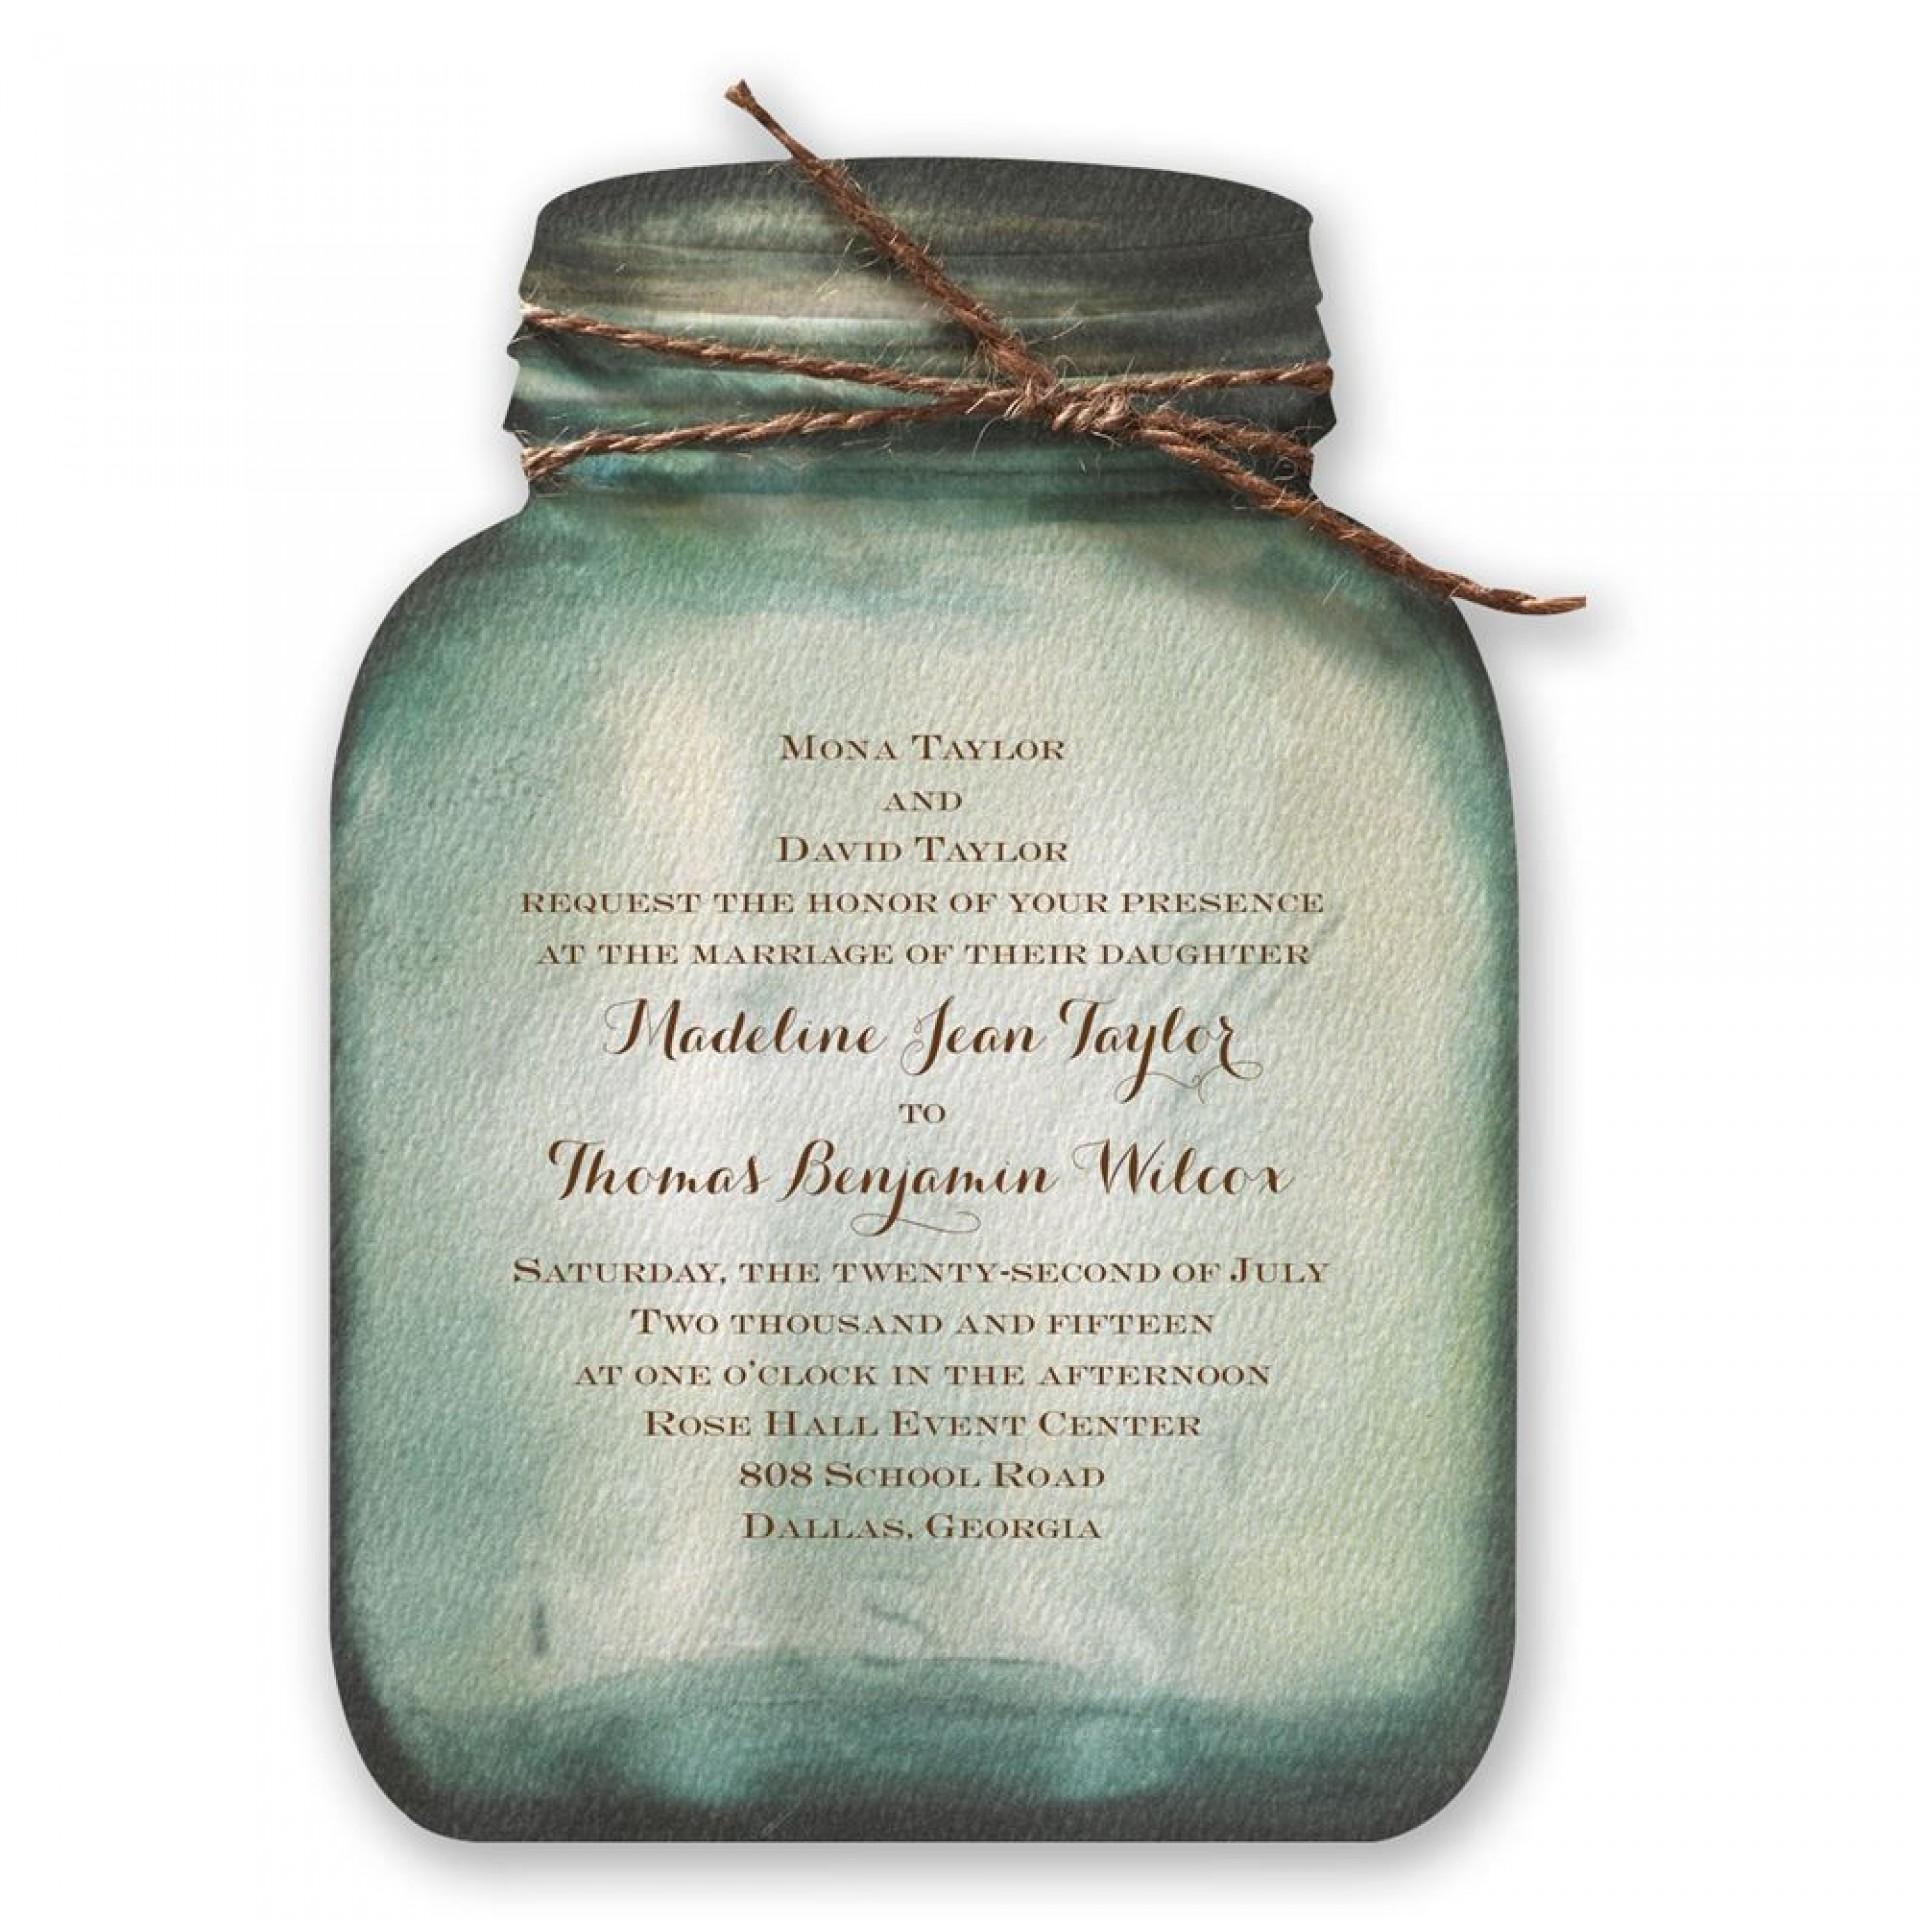 007 Remarkable Mason Jar Invitation Template Image  Free Wedding Shower Rustic1920